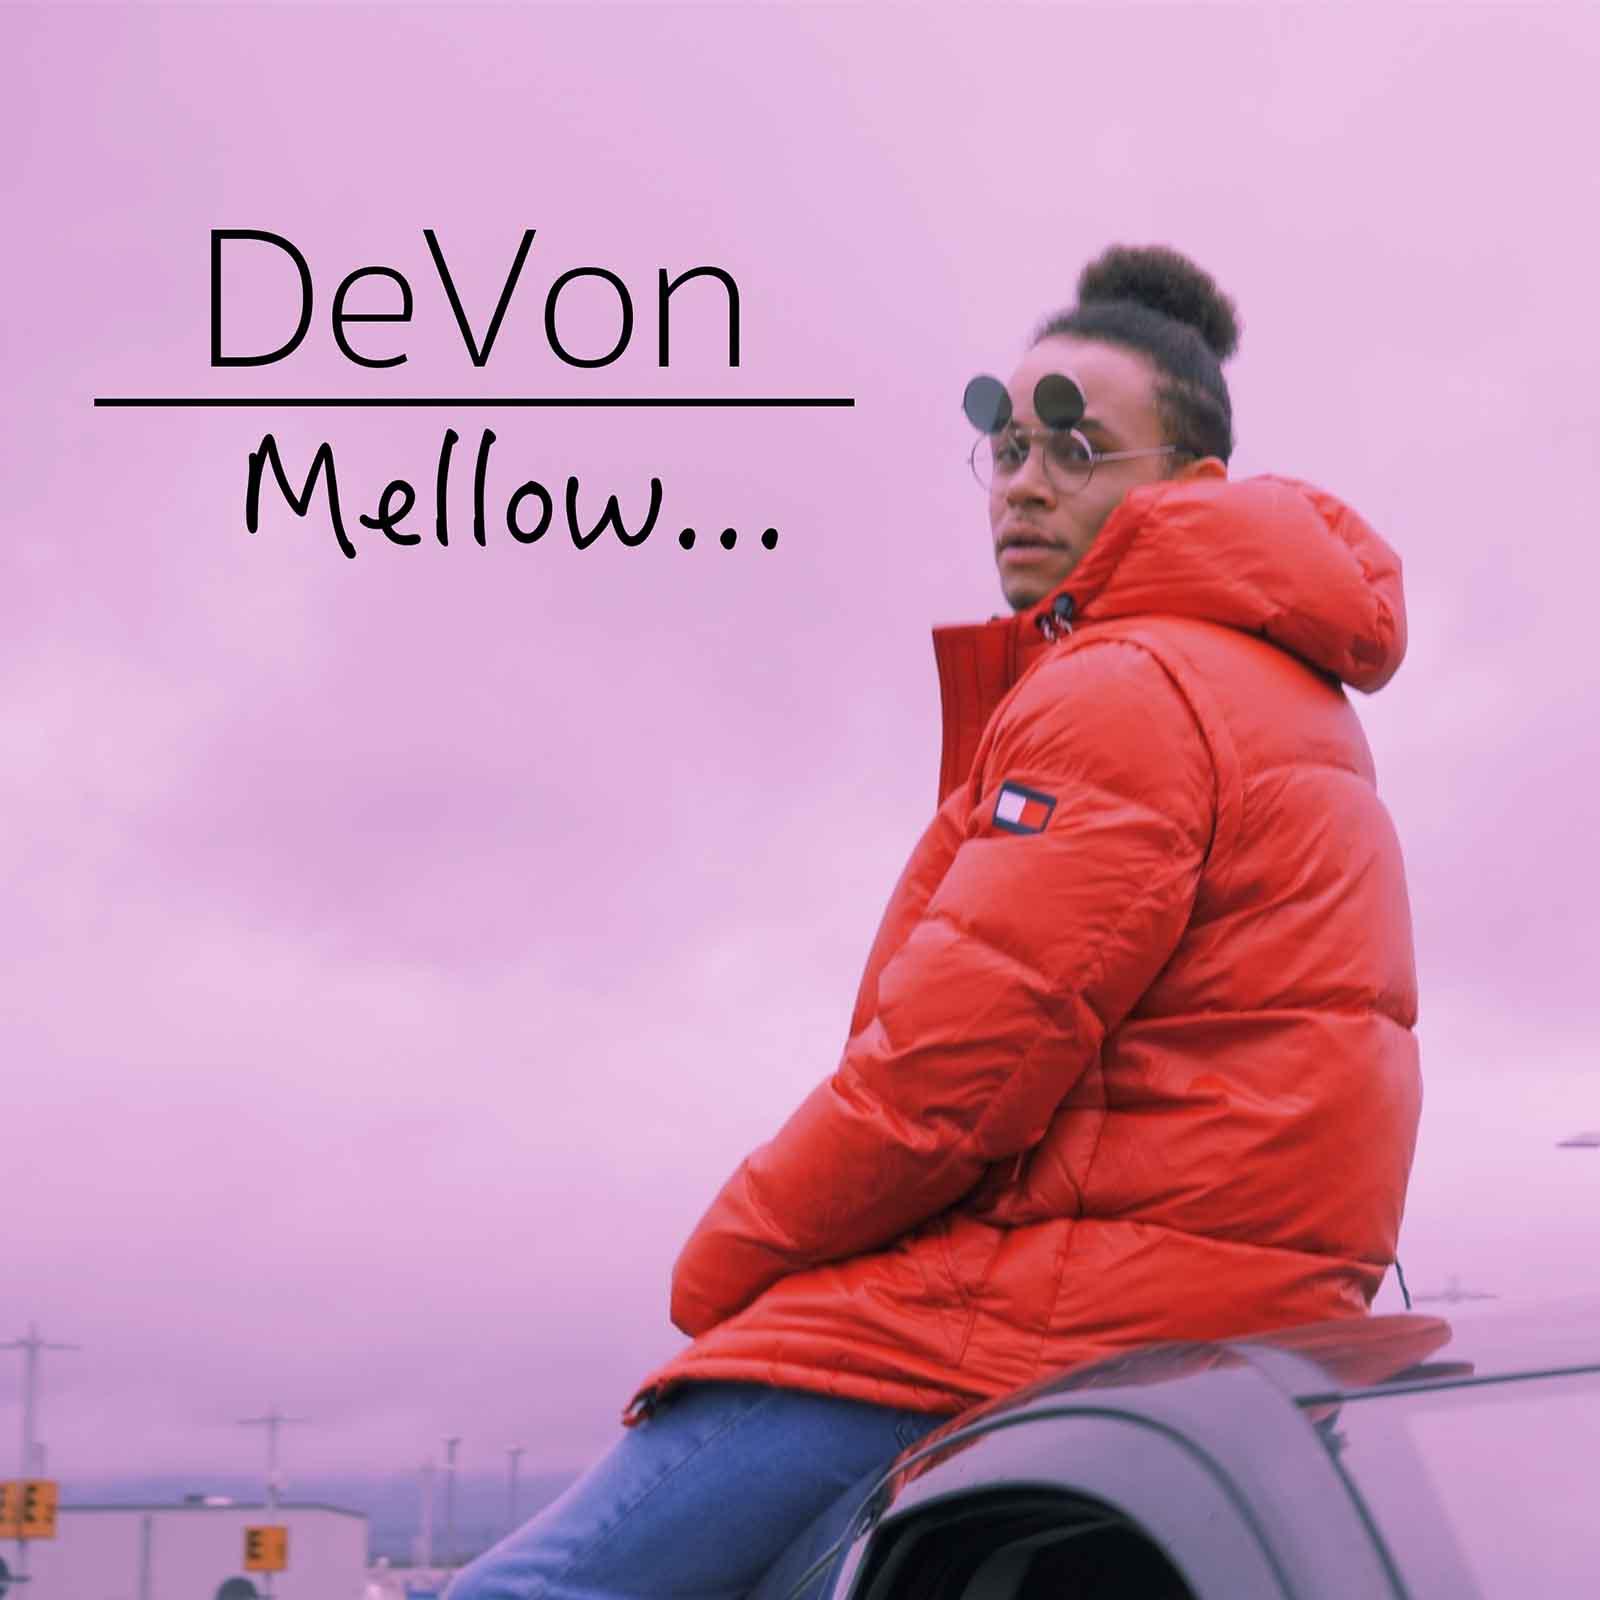 Upcoming: Devon - Mellow